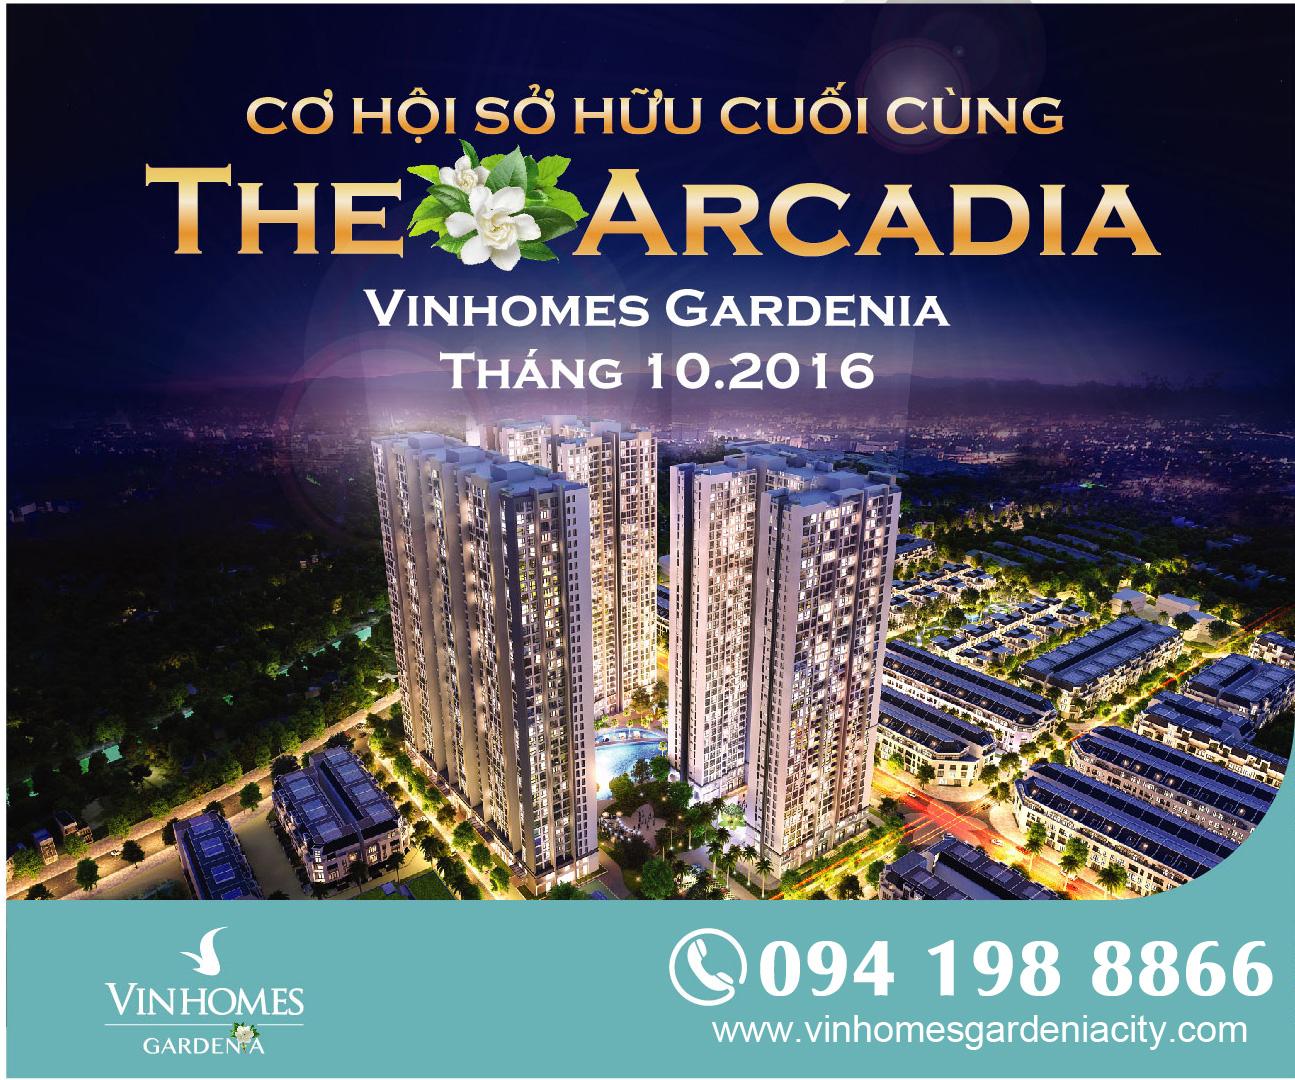 co-hoi-cuoi-cung-so-huu-a3-vinhomes-gardenia